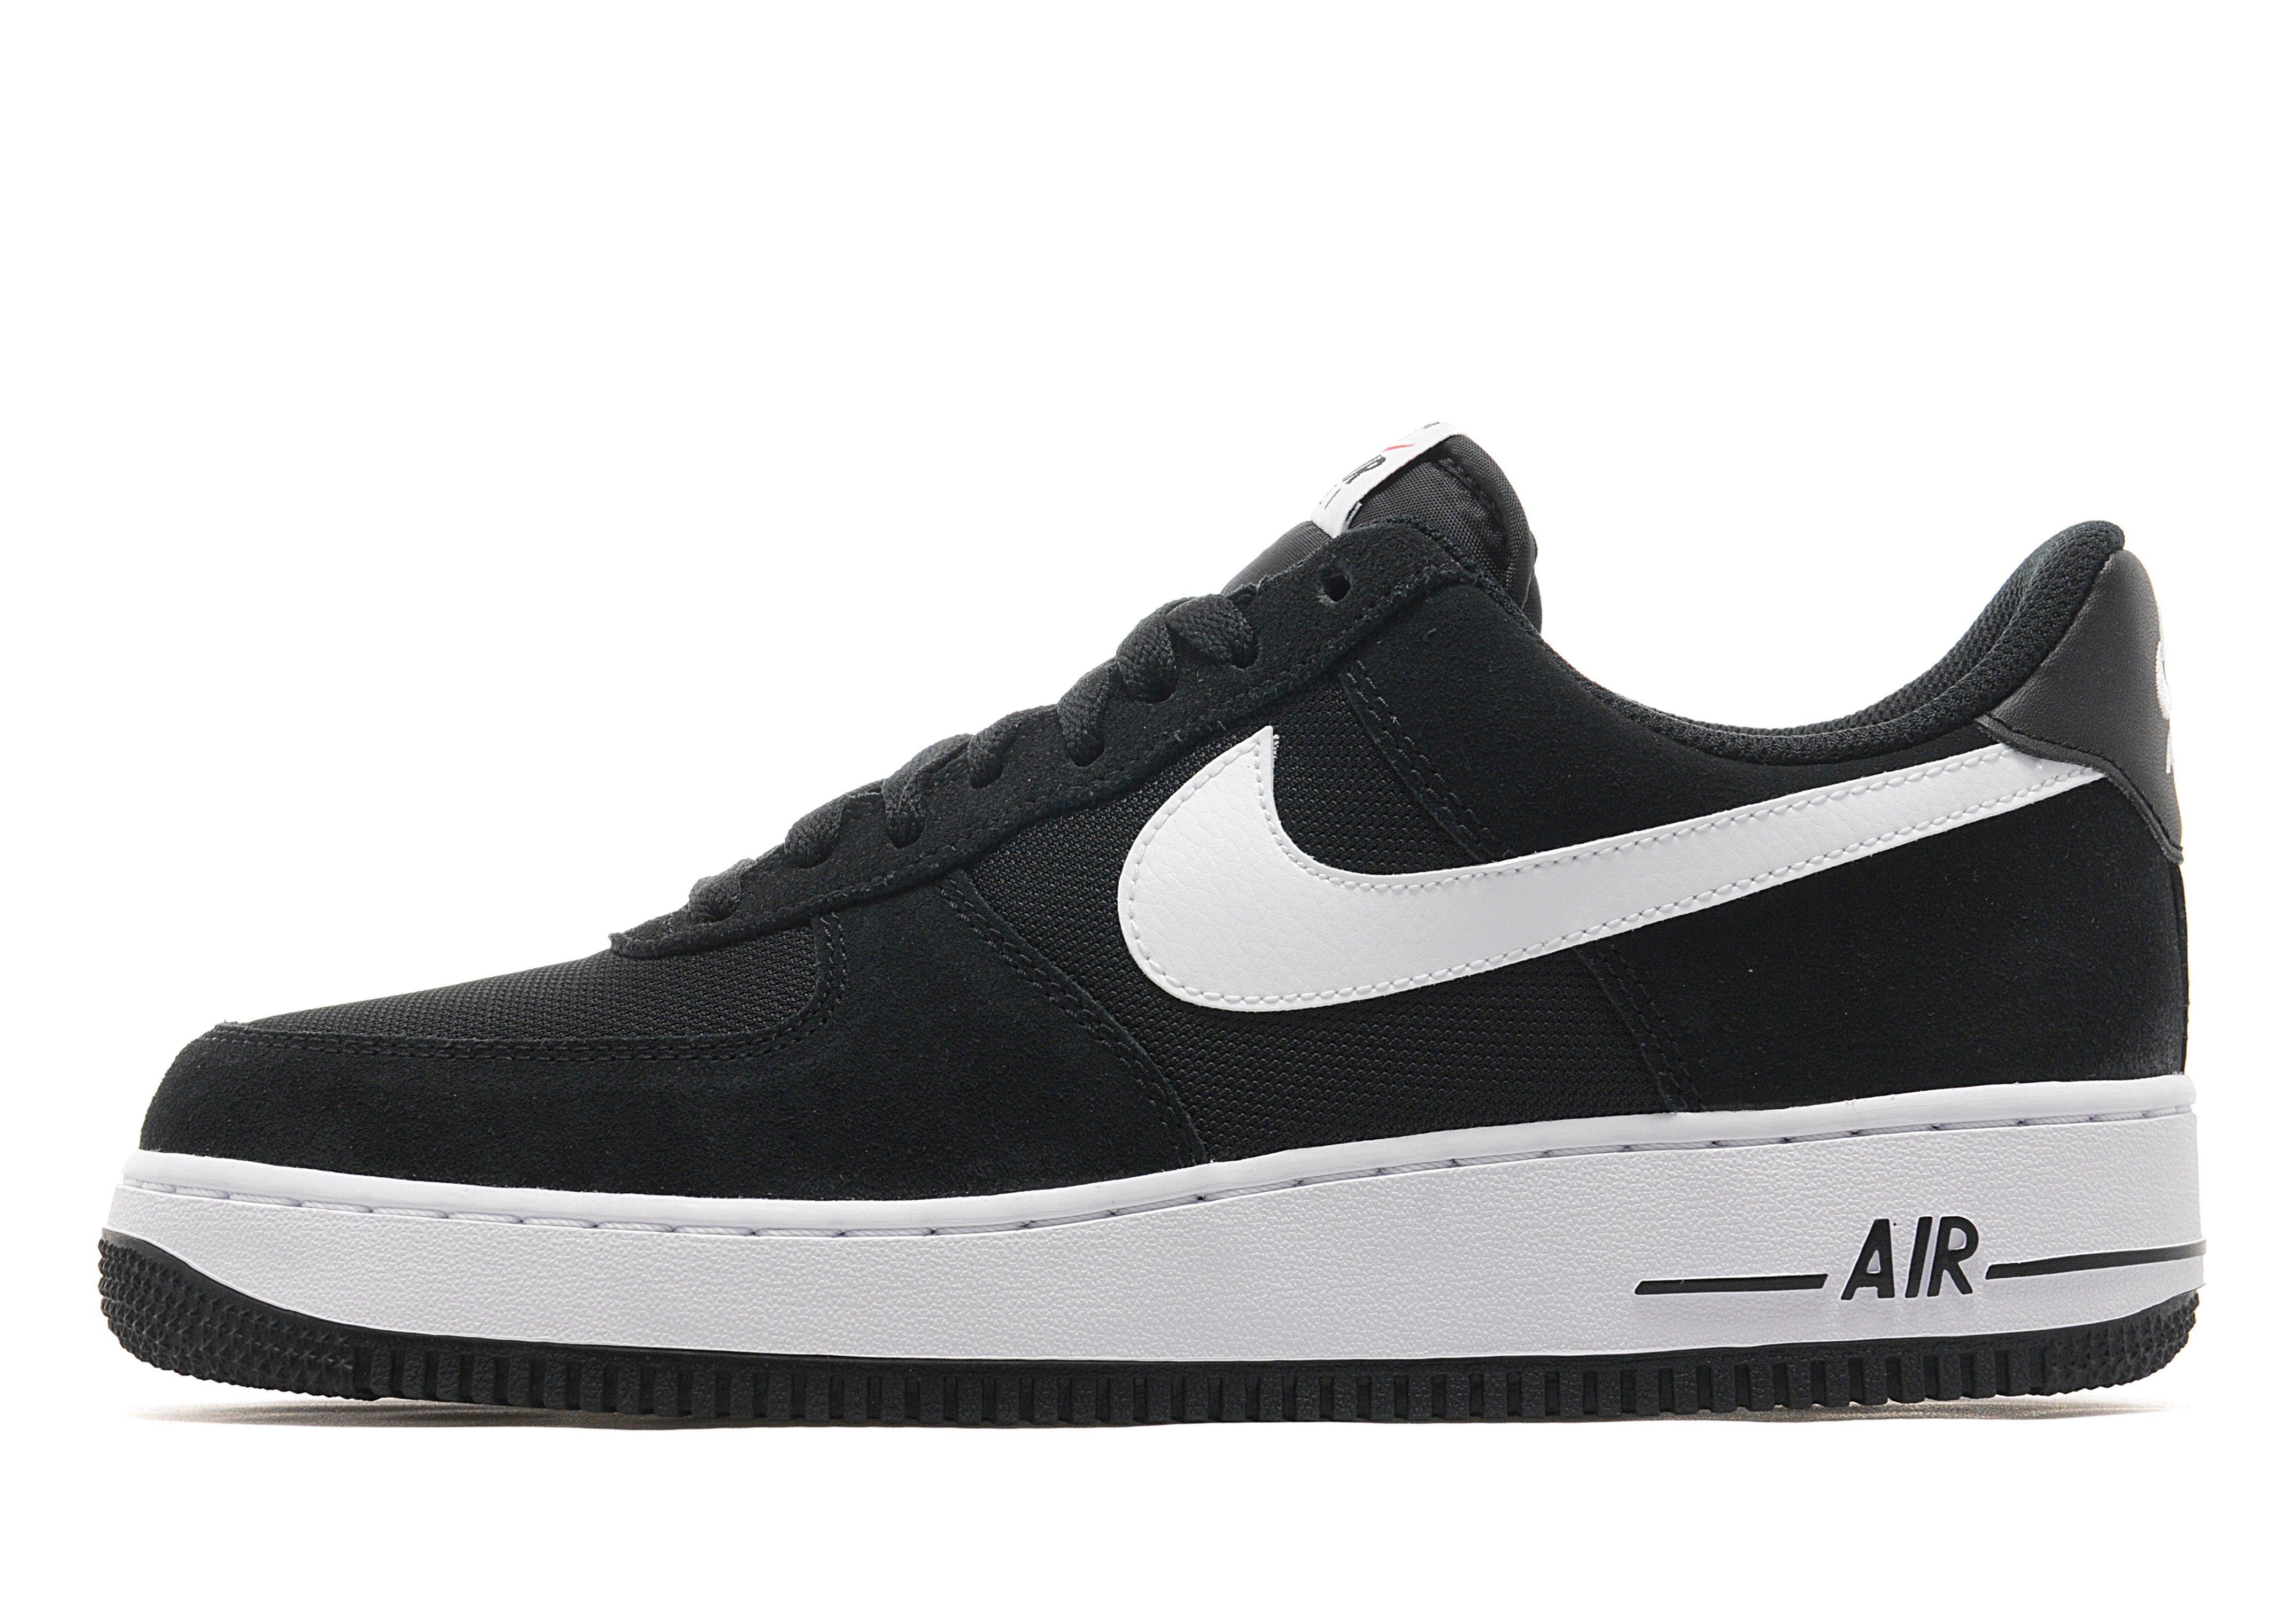 dames nike air force 1 low premium zwarte schoenen